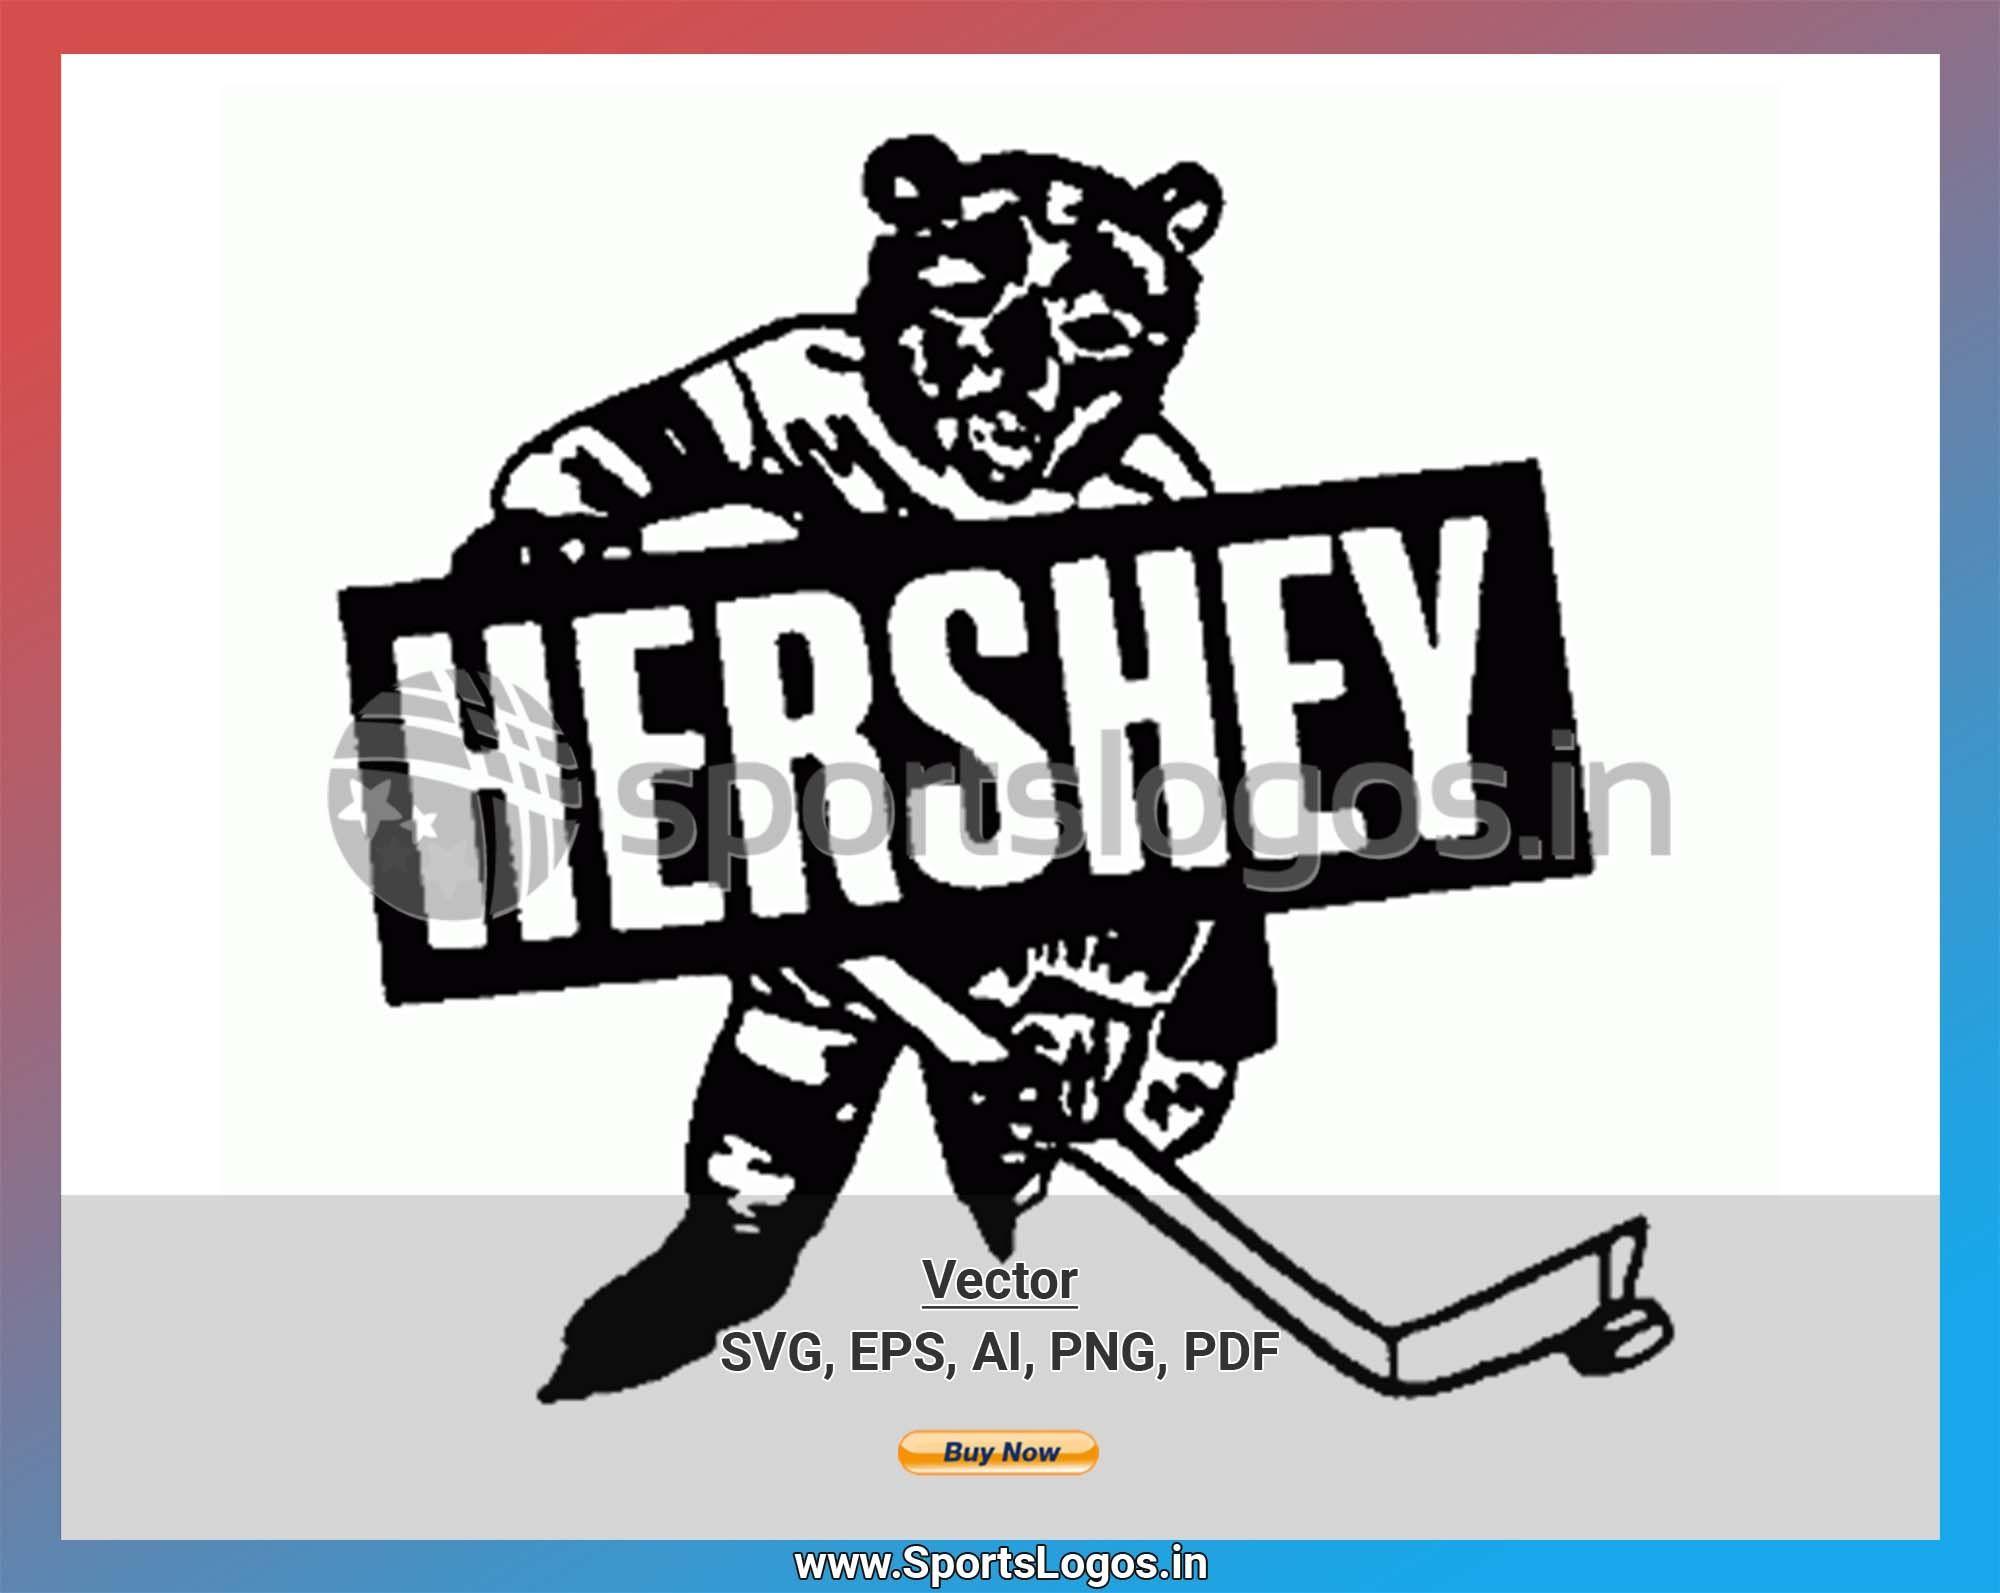 Hershey Bears Hockey Sports Vector Svg Logo In 5 Formats Spln001828 Sports Logos Embroidery Vector For Nfl Nba Nhl Mlb Milb And More American Hockey League Sport Hockey Hershey Bears